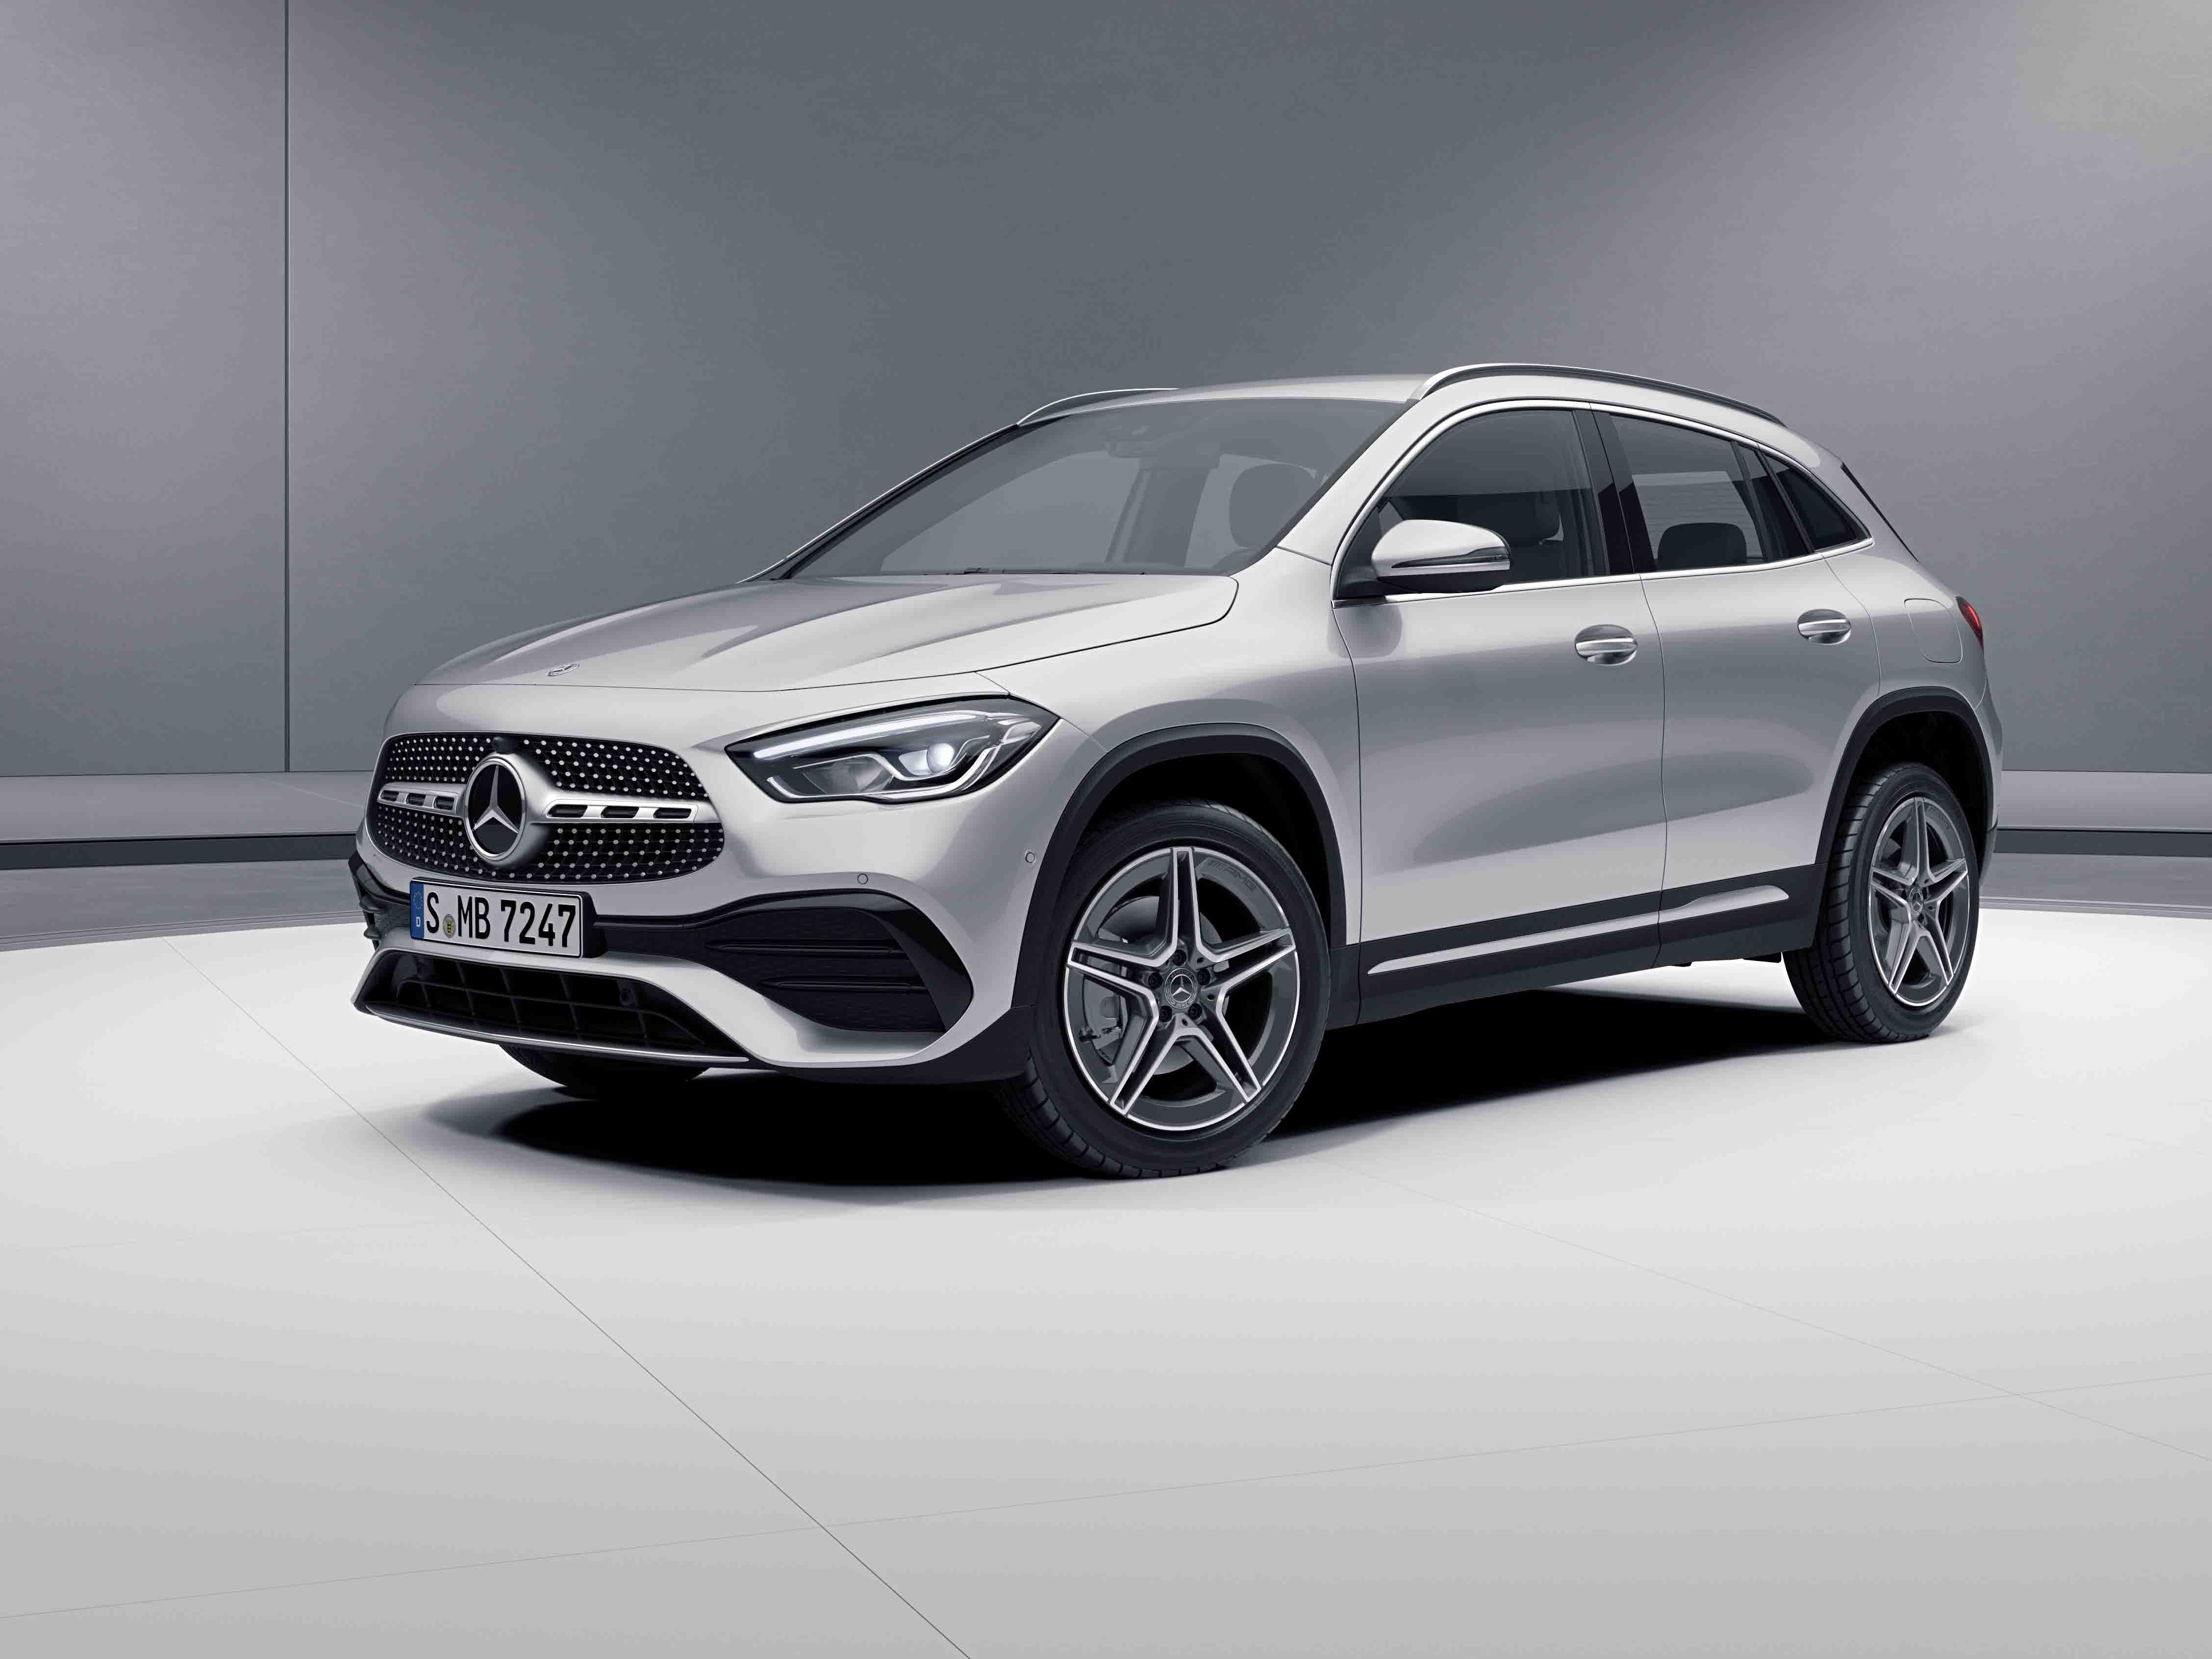 Vue de trois quarts de profil de la Mercedes GLA avec la peinture Métallisé - Argent Iridium